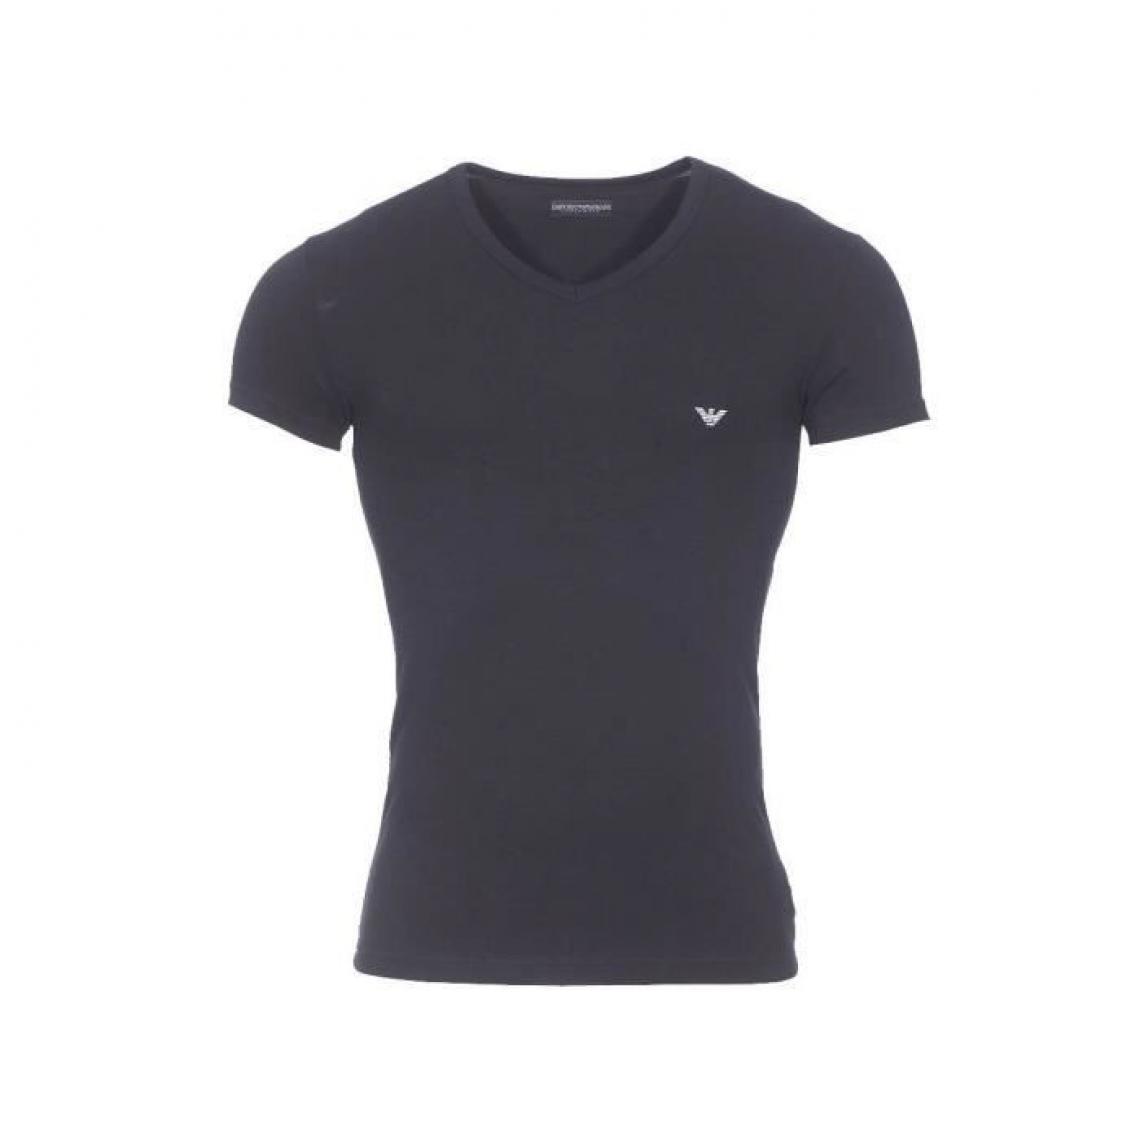 Suisses Shirt Emporio T Eagle Armani Stretch Coton Underwear3 rsQthd